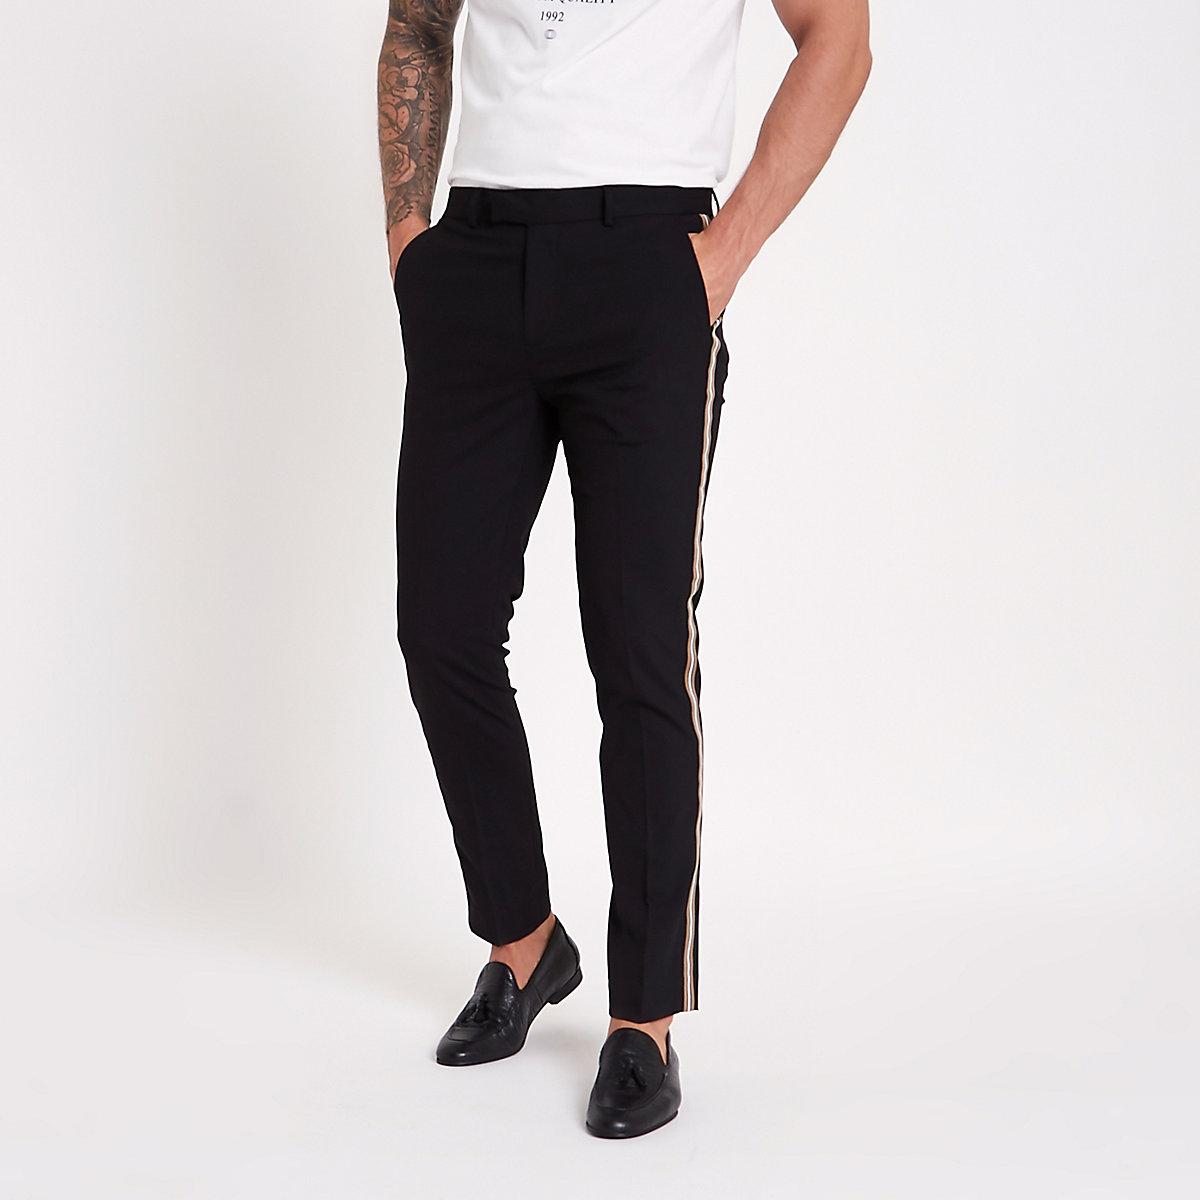 Black tape side skinny fit pants